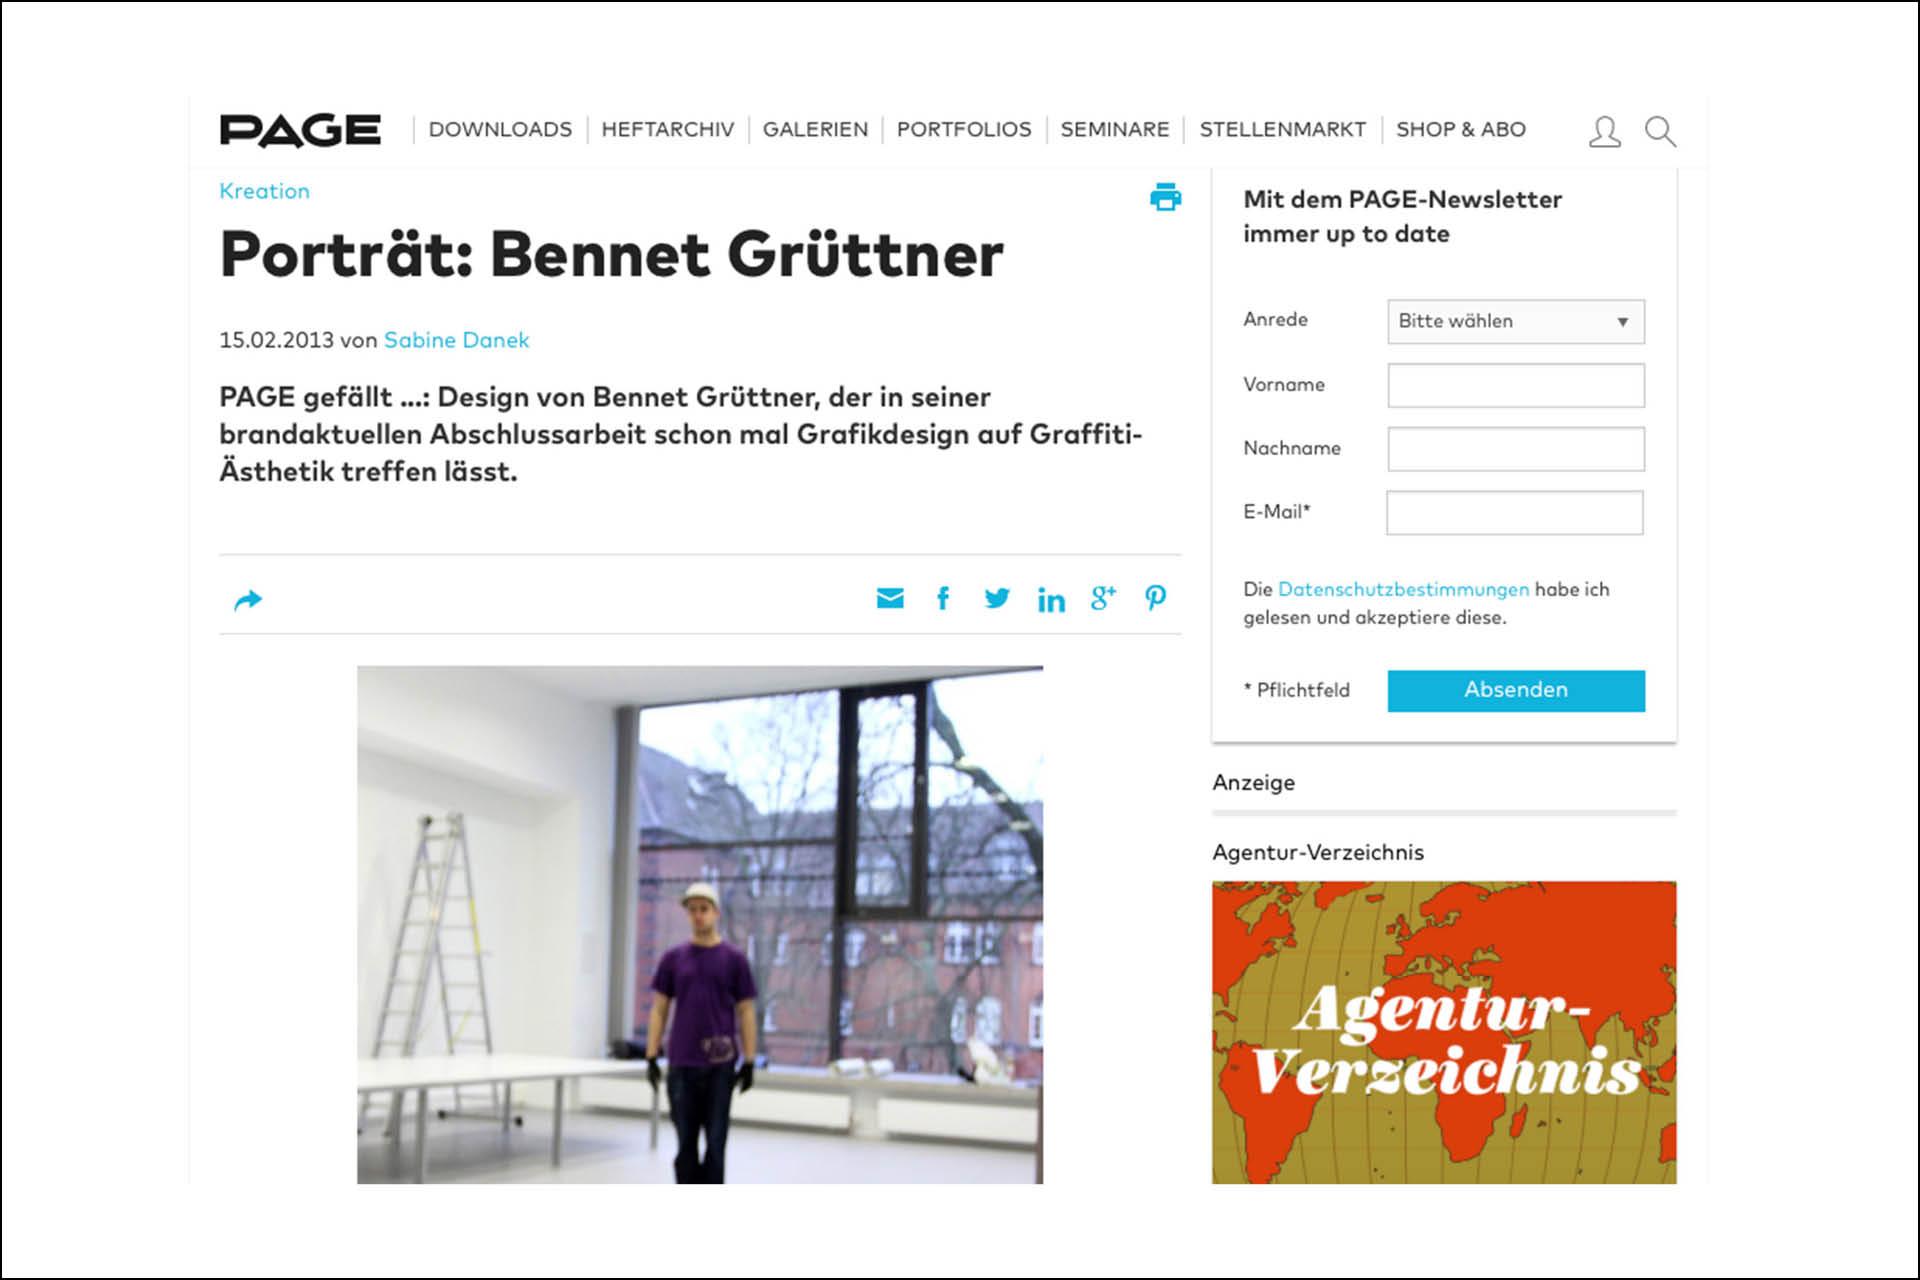 Presse, Artikel, Graffiti, Design, Auckz, Internet, Bericht, Grüttner